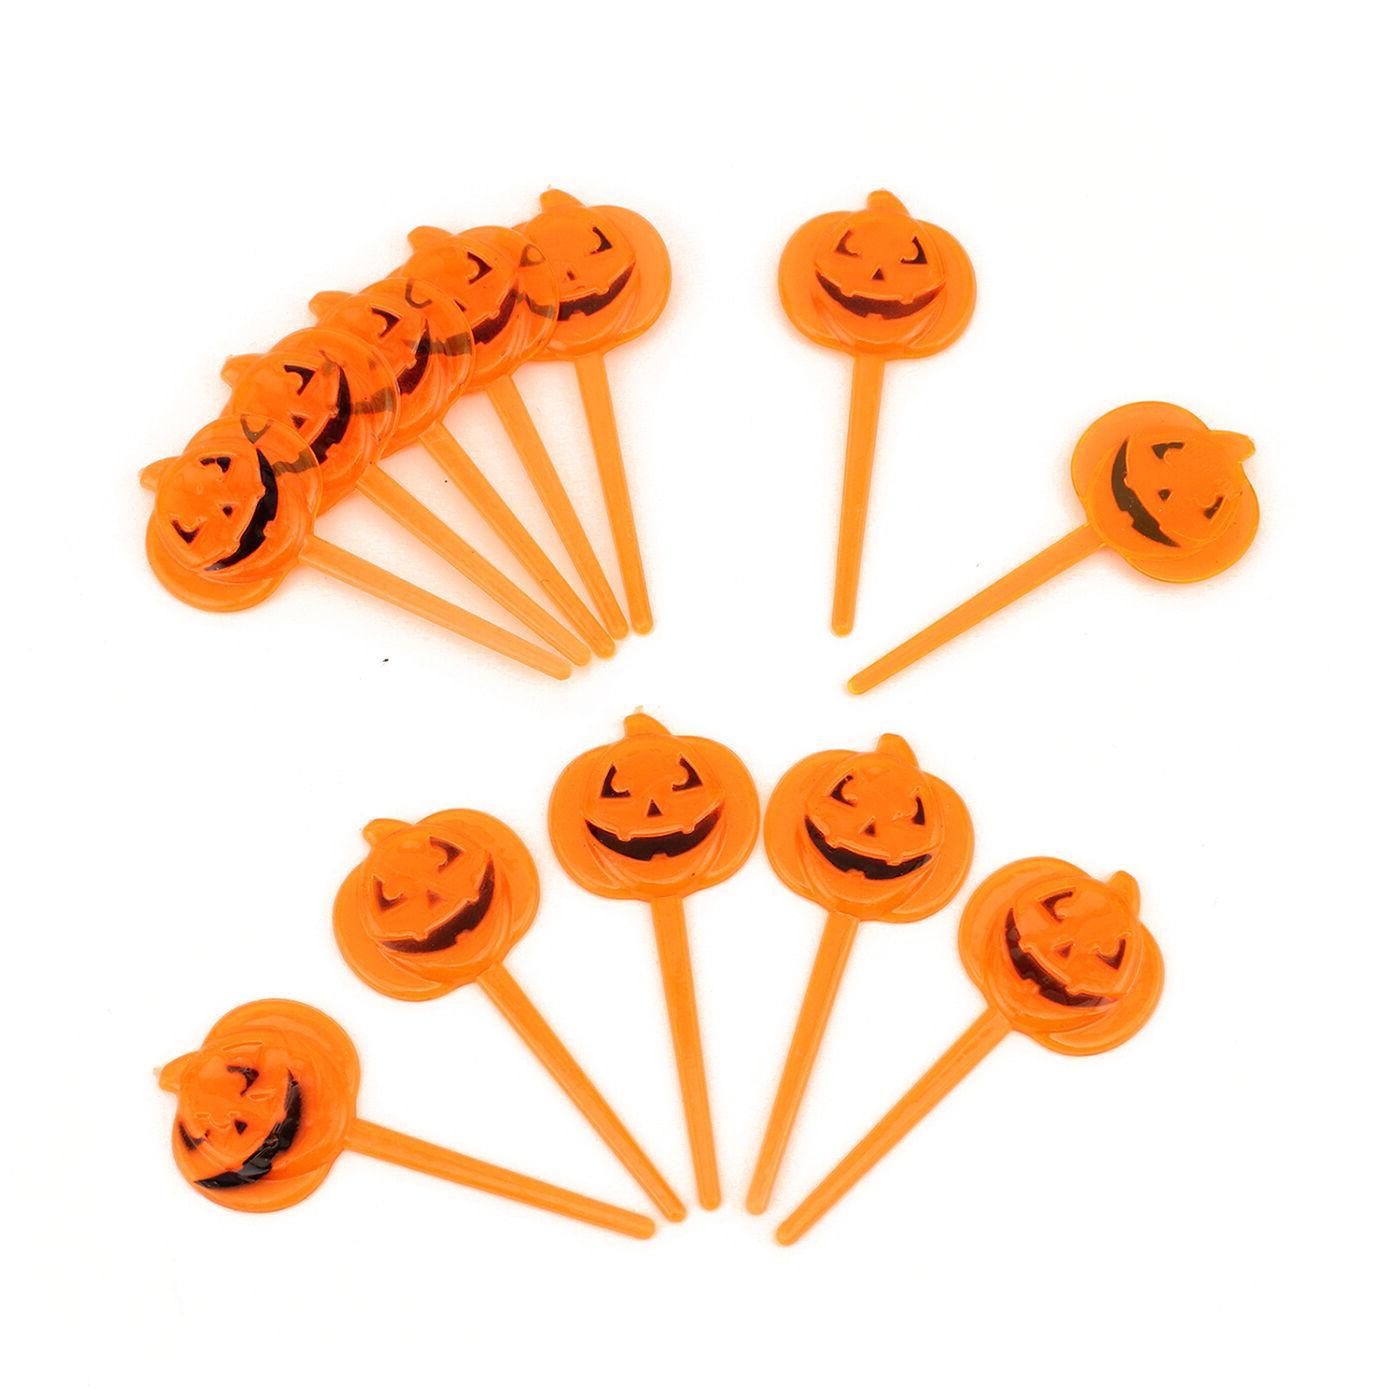 Halloween Plastic Orange Pumpkin Party Appetizers Cupcake Pi